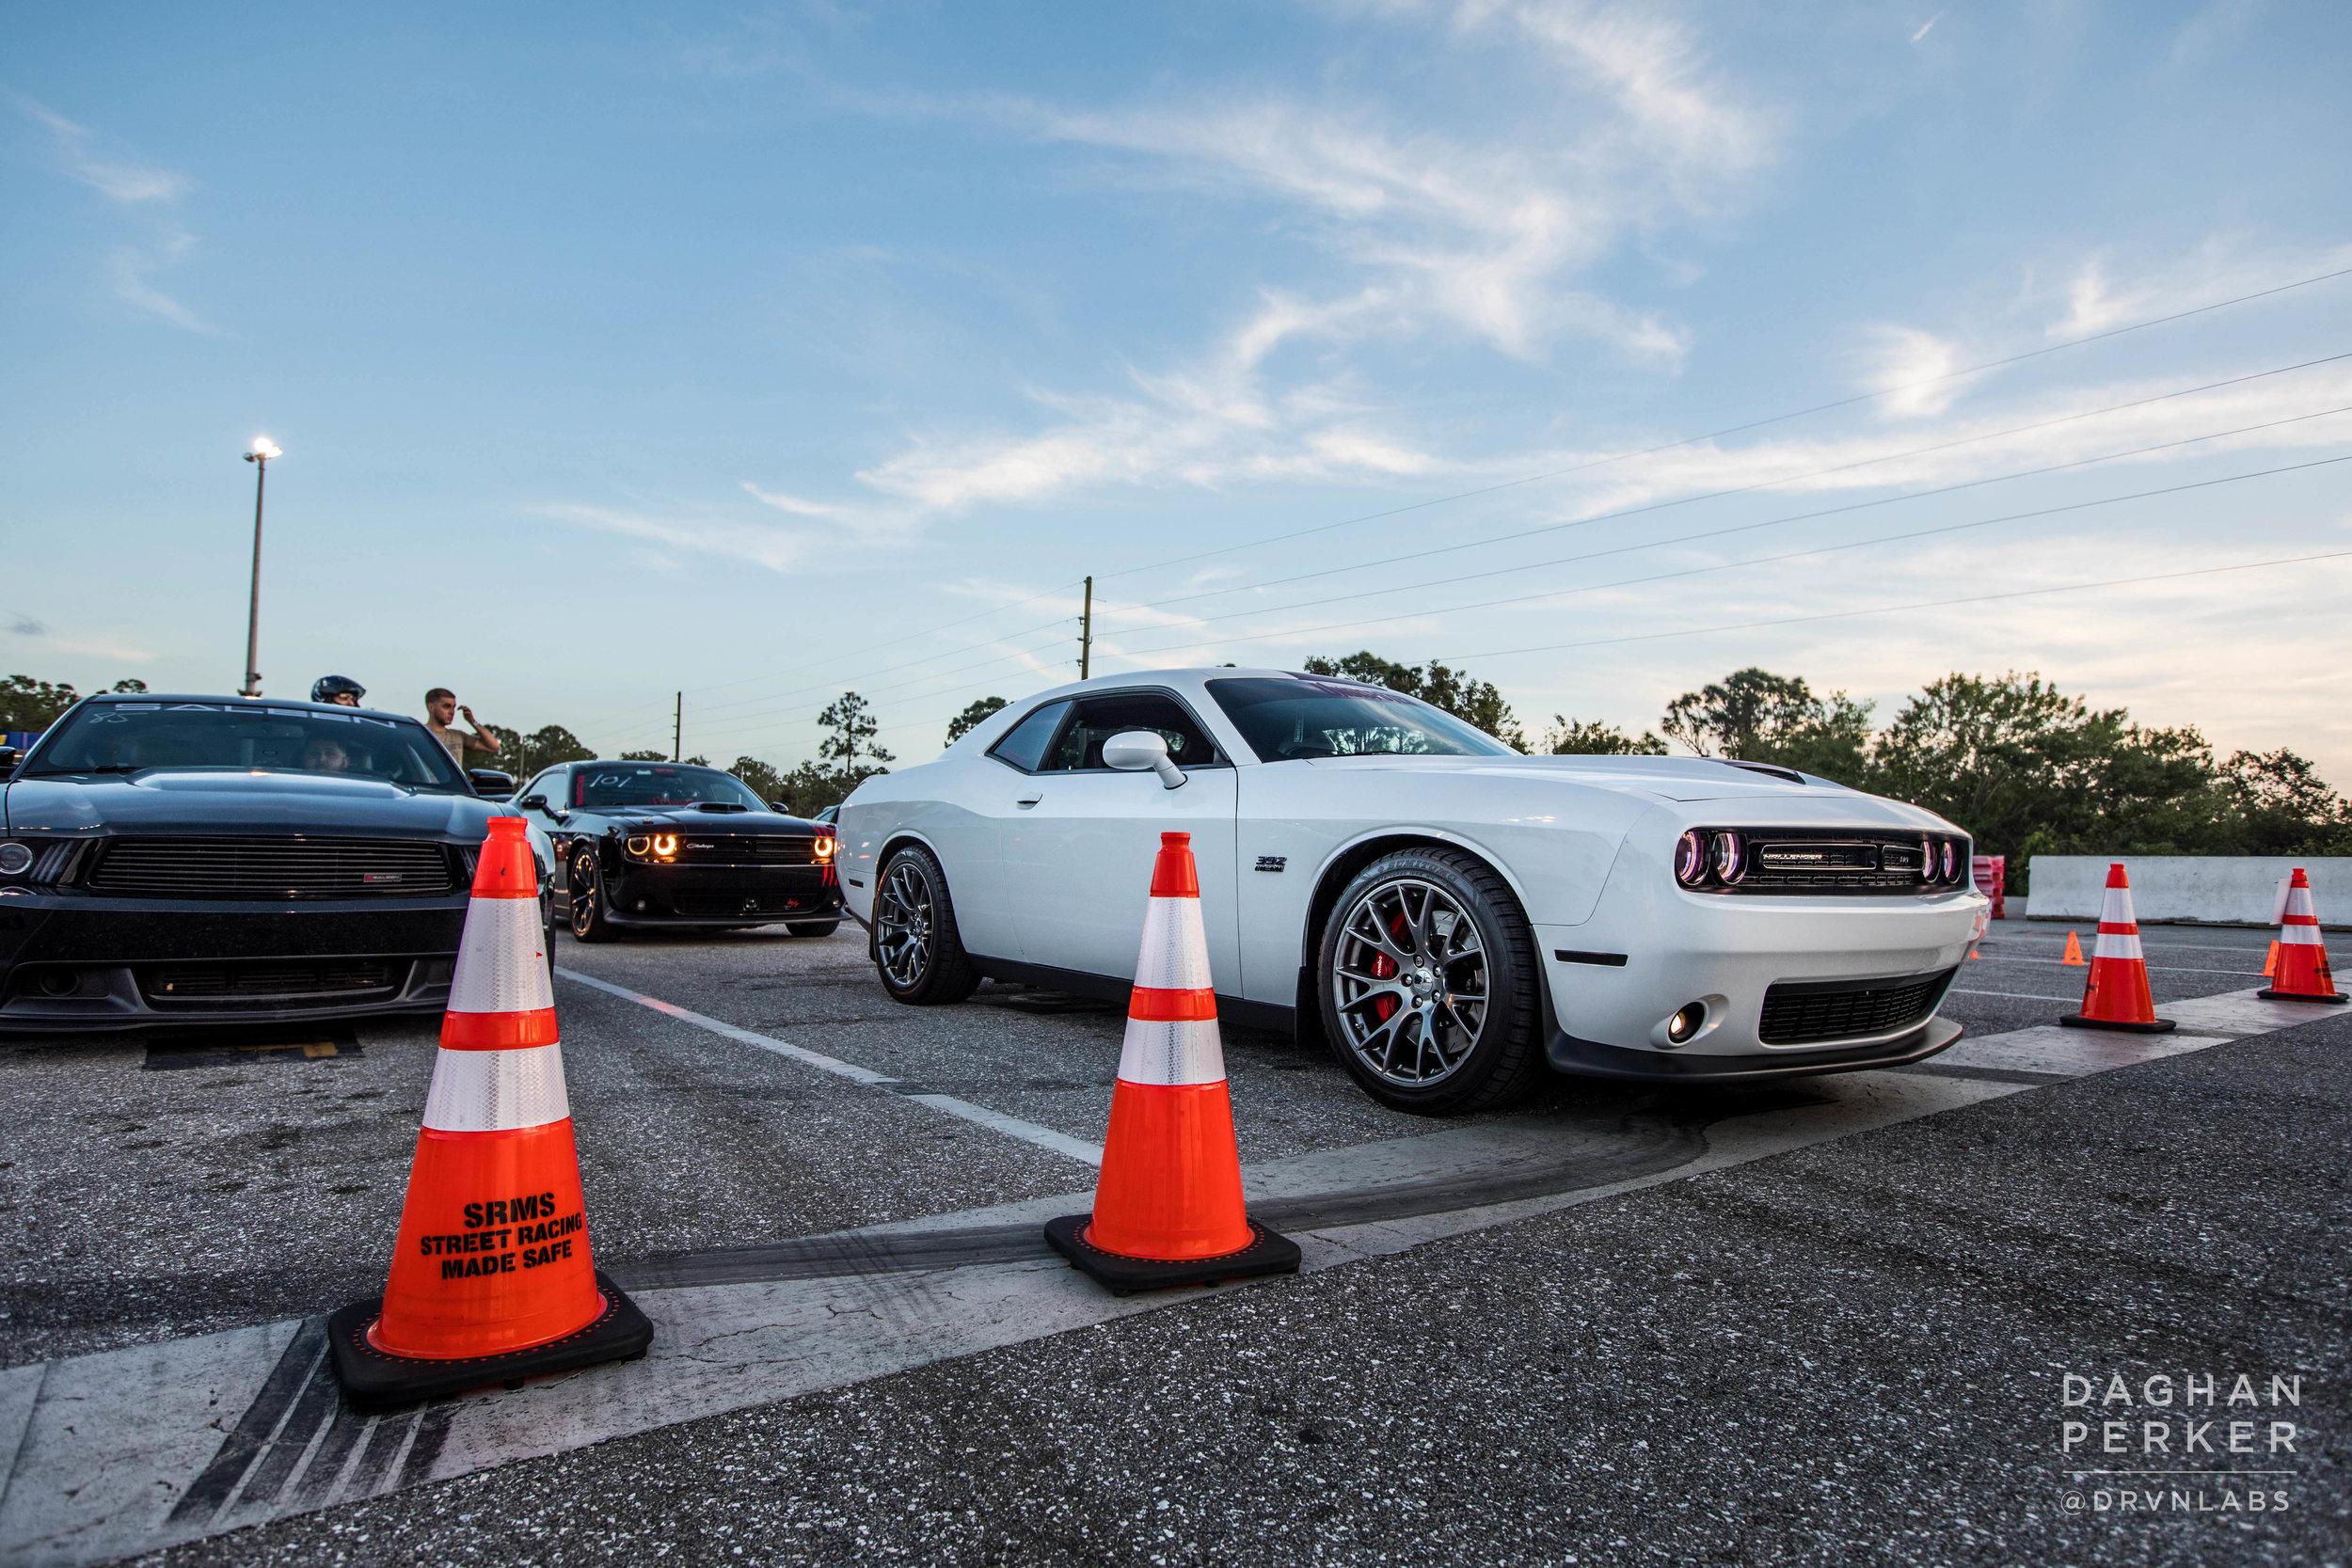 180210-Miami_cars-0454.jpg